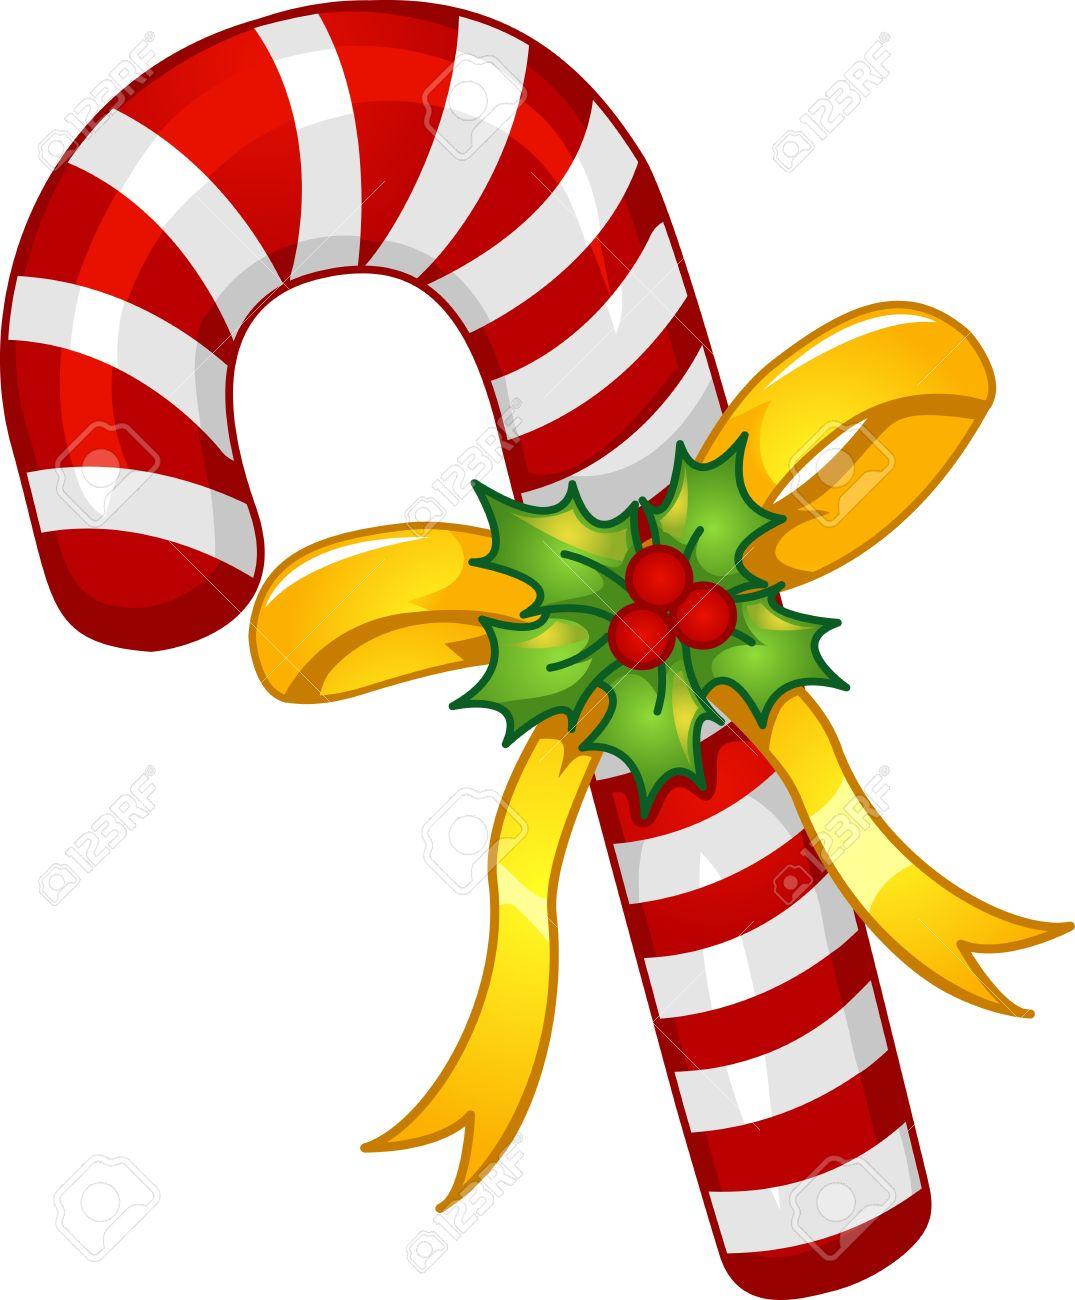 1075x1300 Candy Cane Clipart December